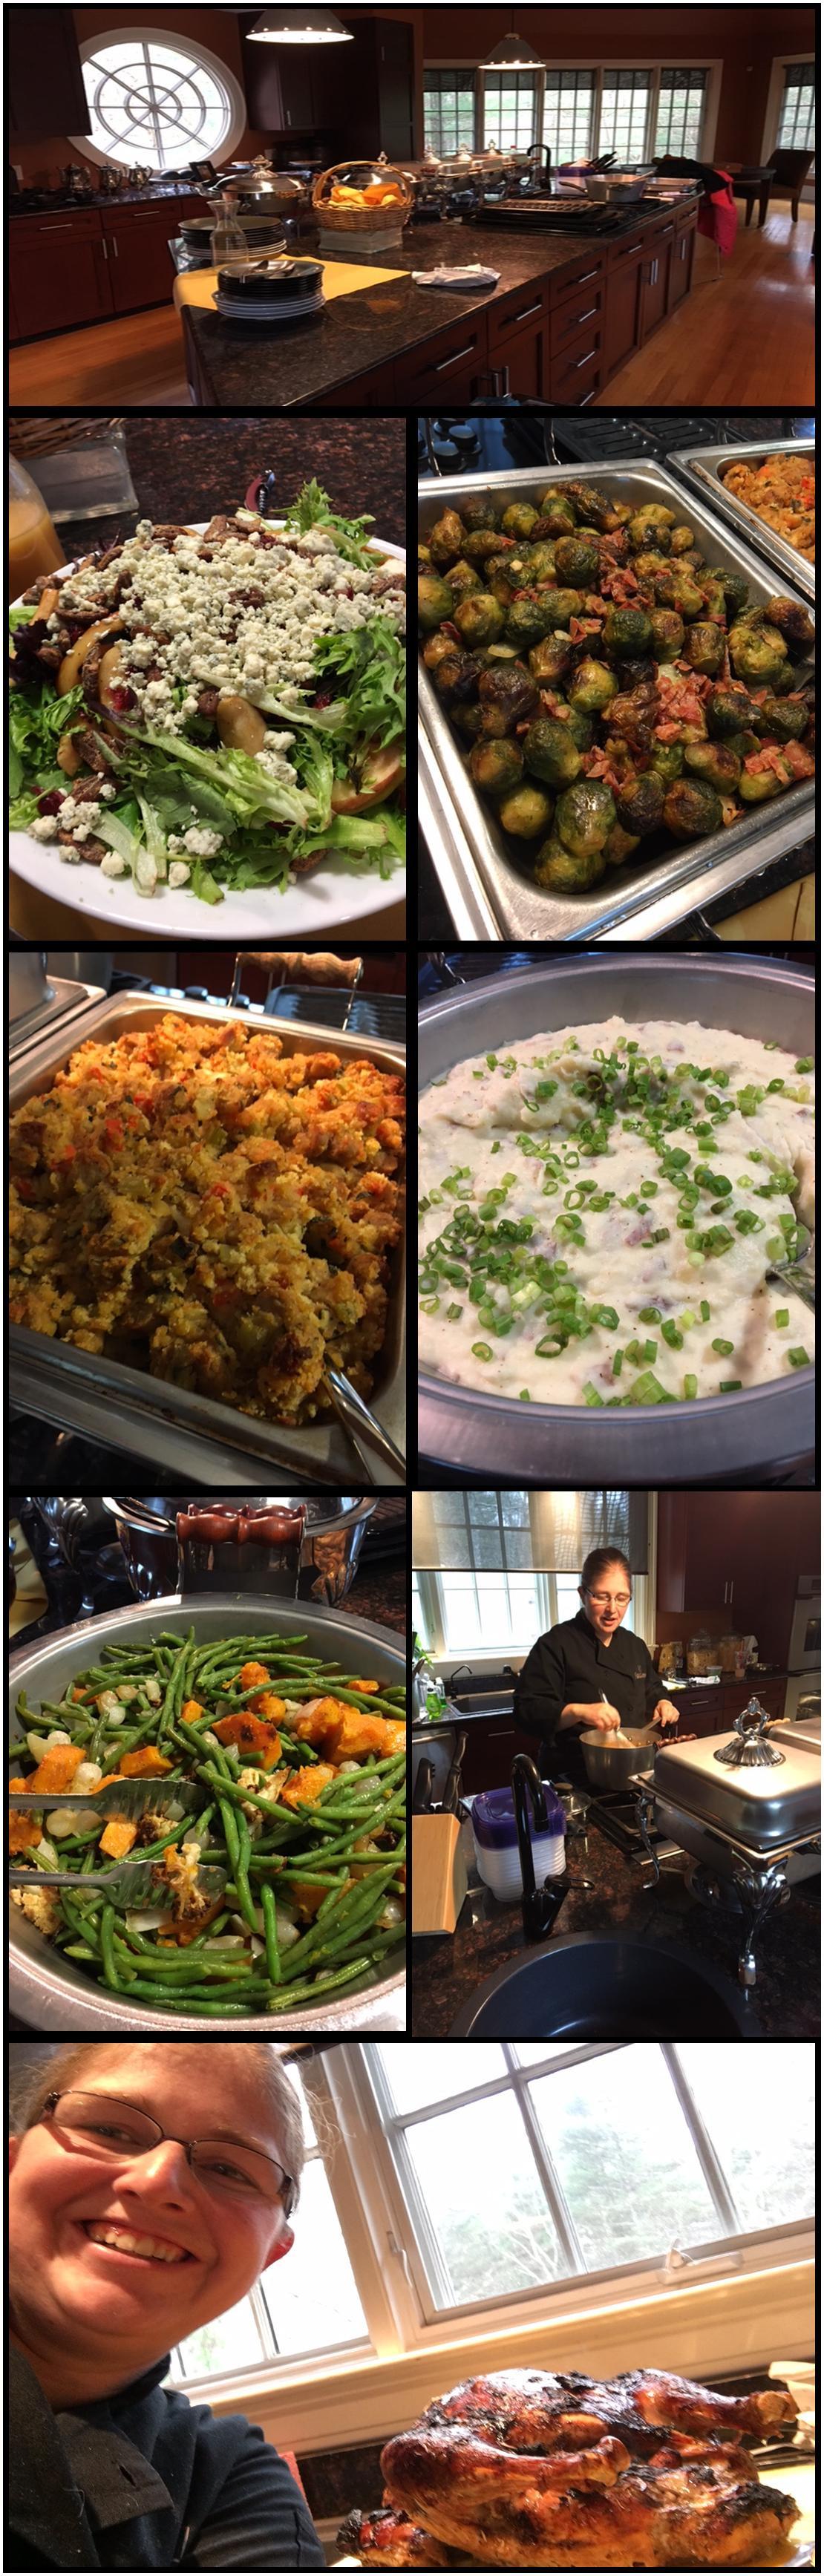 Thanksgiving Dinner Catering  Catering Thanksgiving Dinner North Smithfield RI 2016